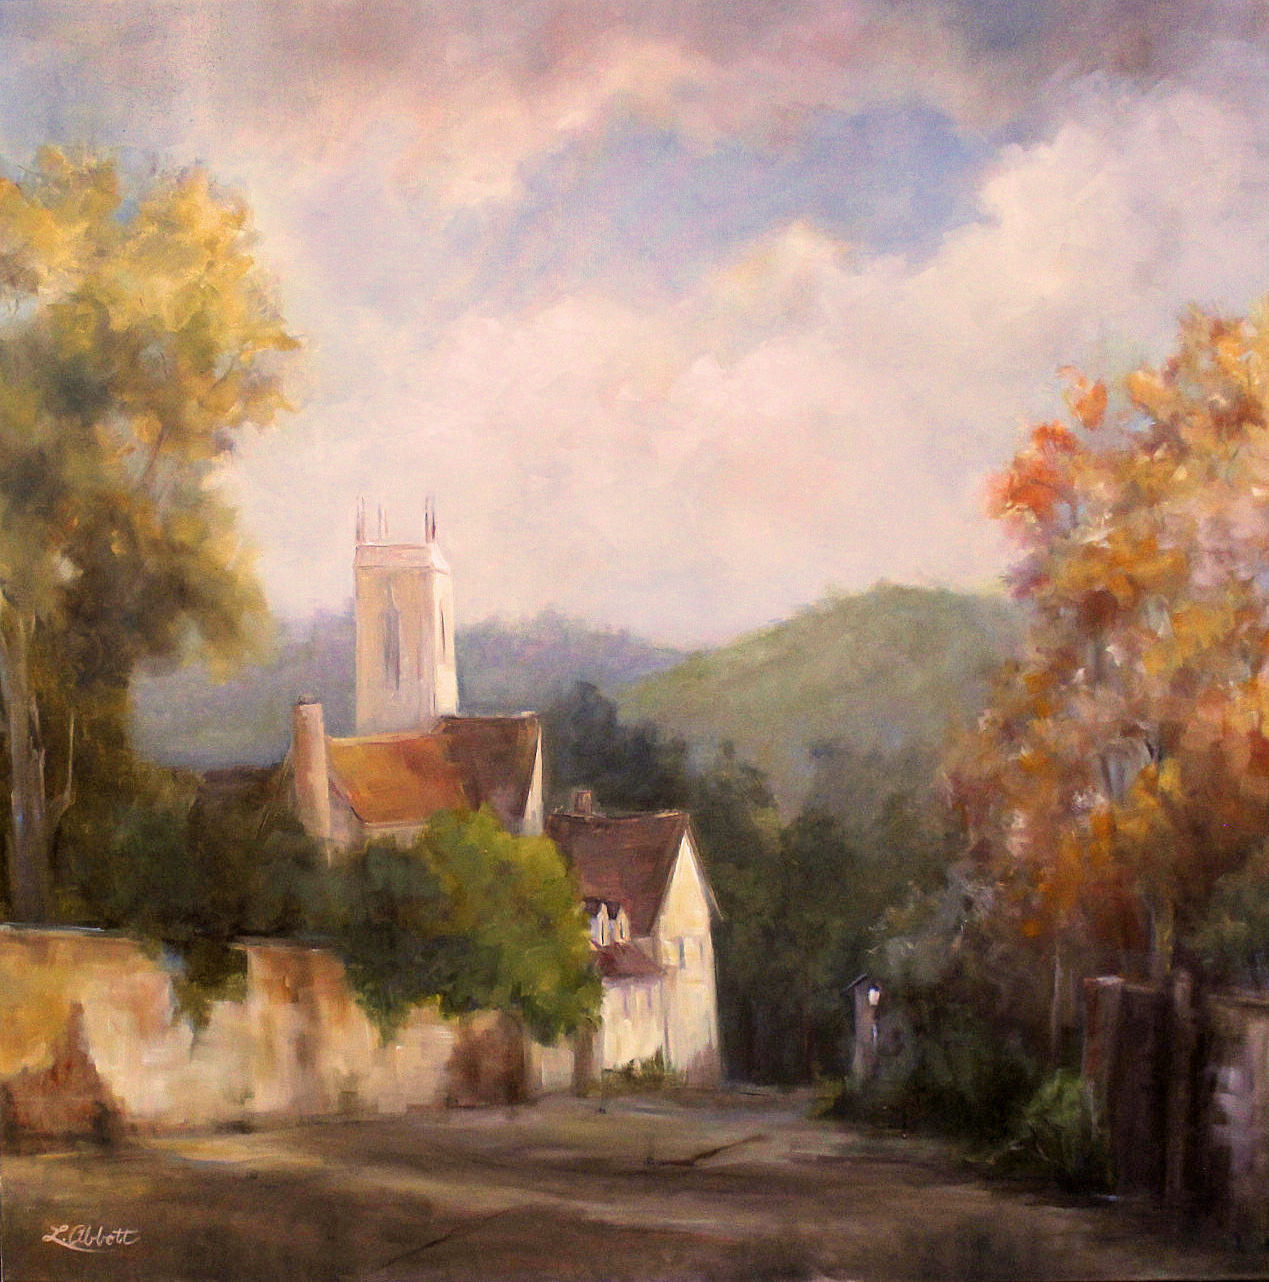 Light and Shadow, Lynn Abbott